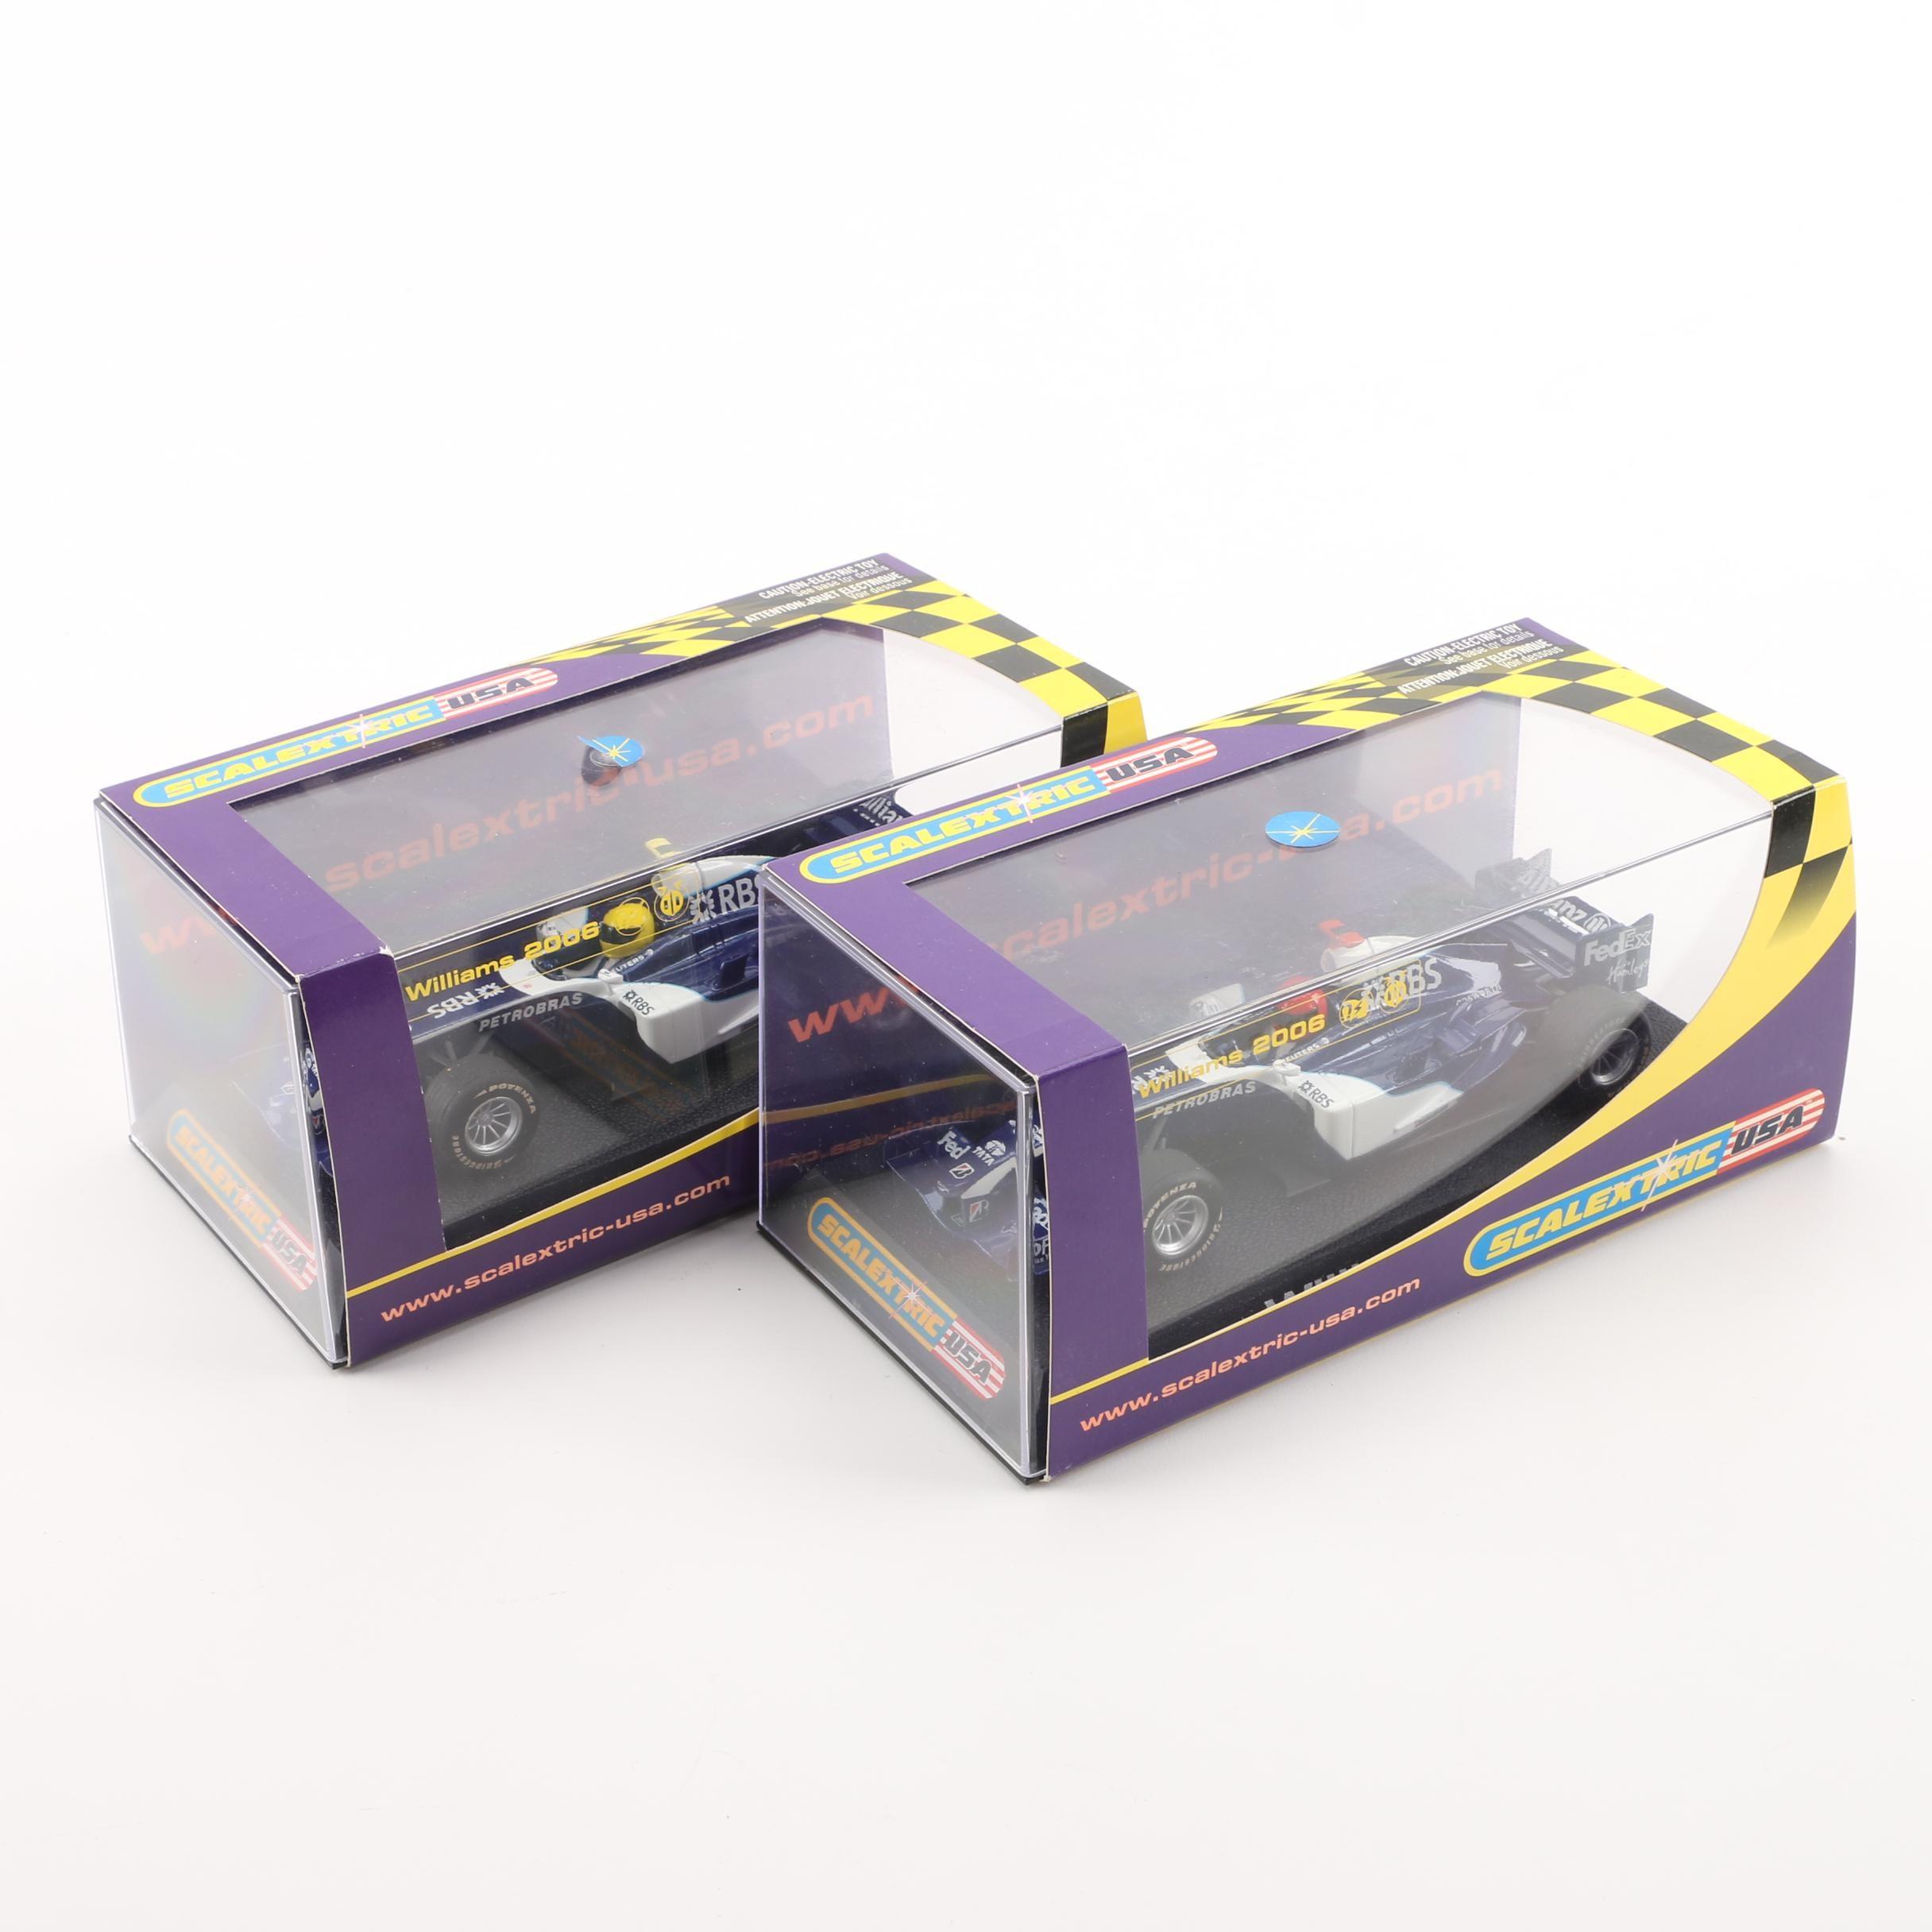 Scalextric Williams 2006 Slot Cars